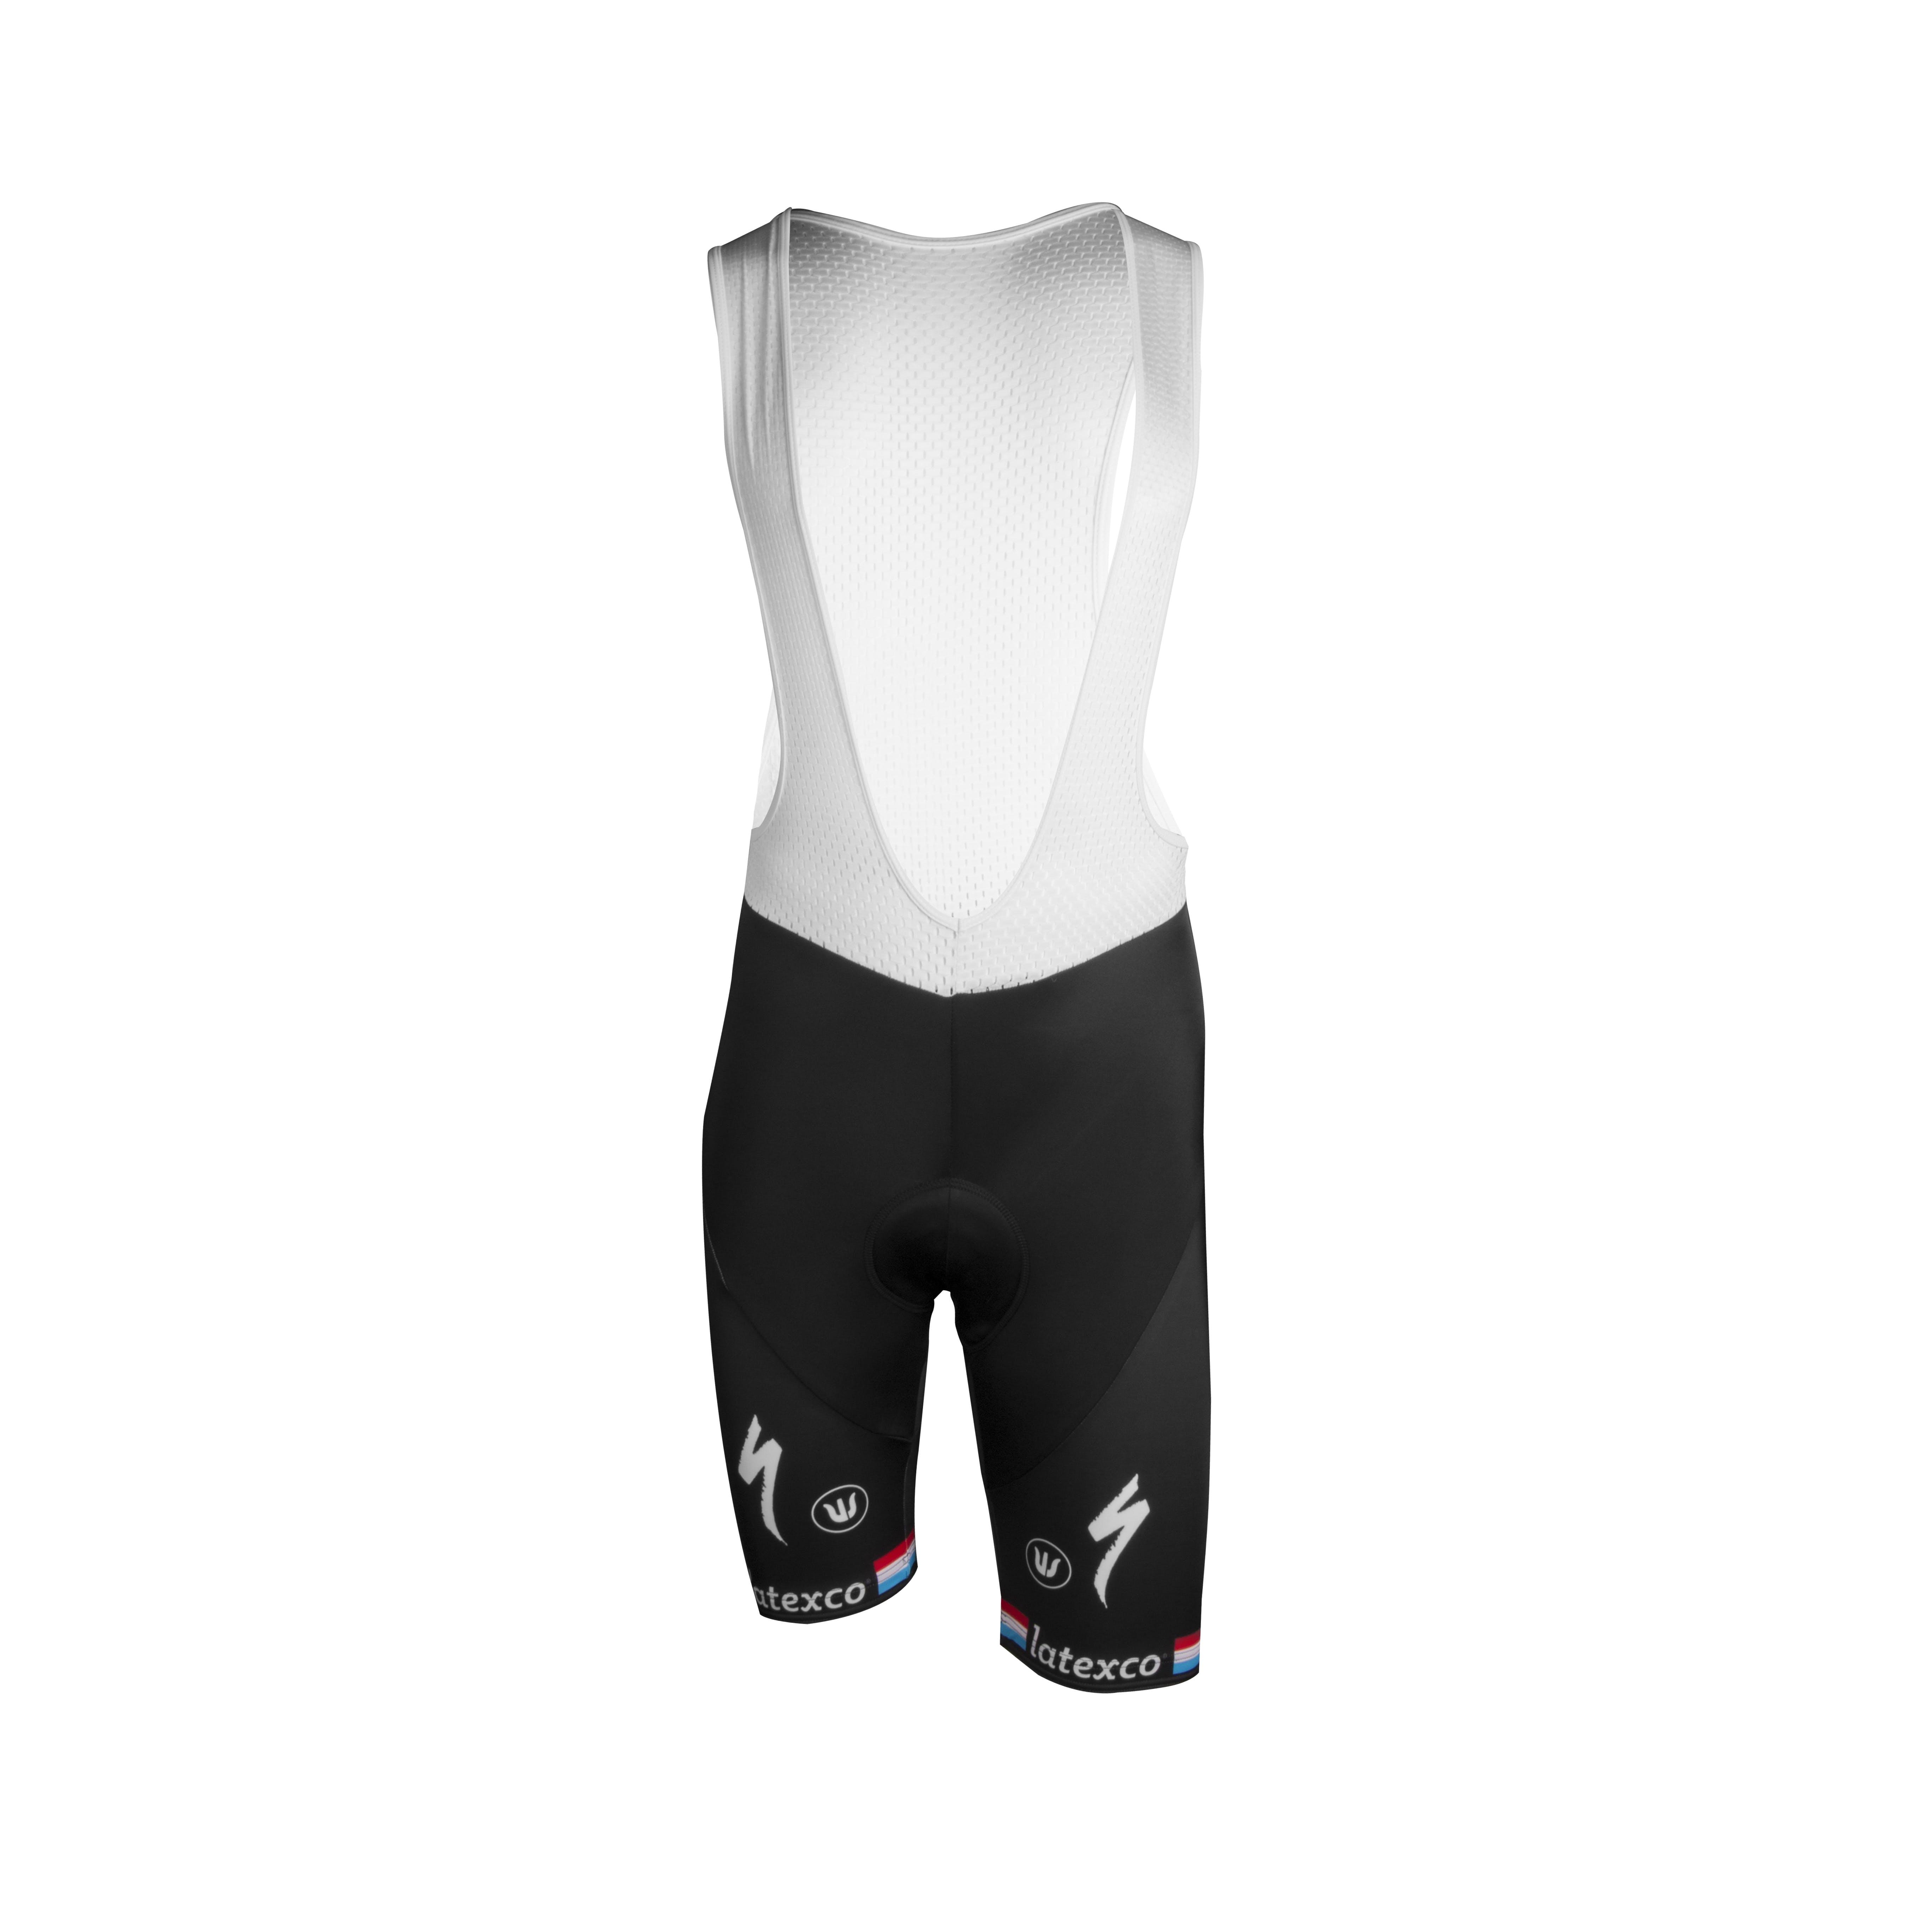 Deceuninck Quick-Step Champion Luxemburg Bib Shorts